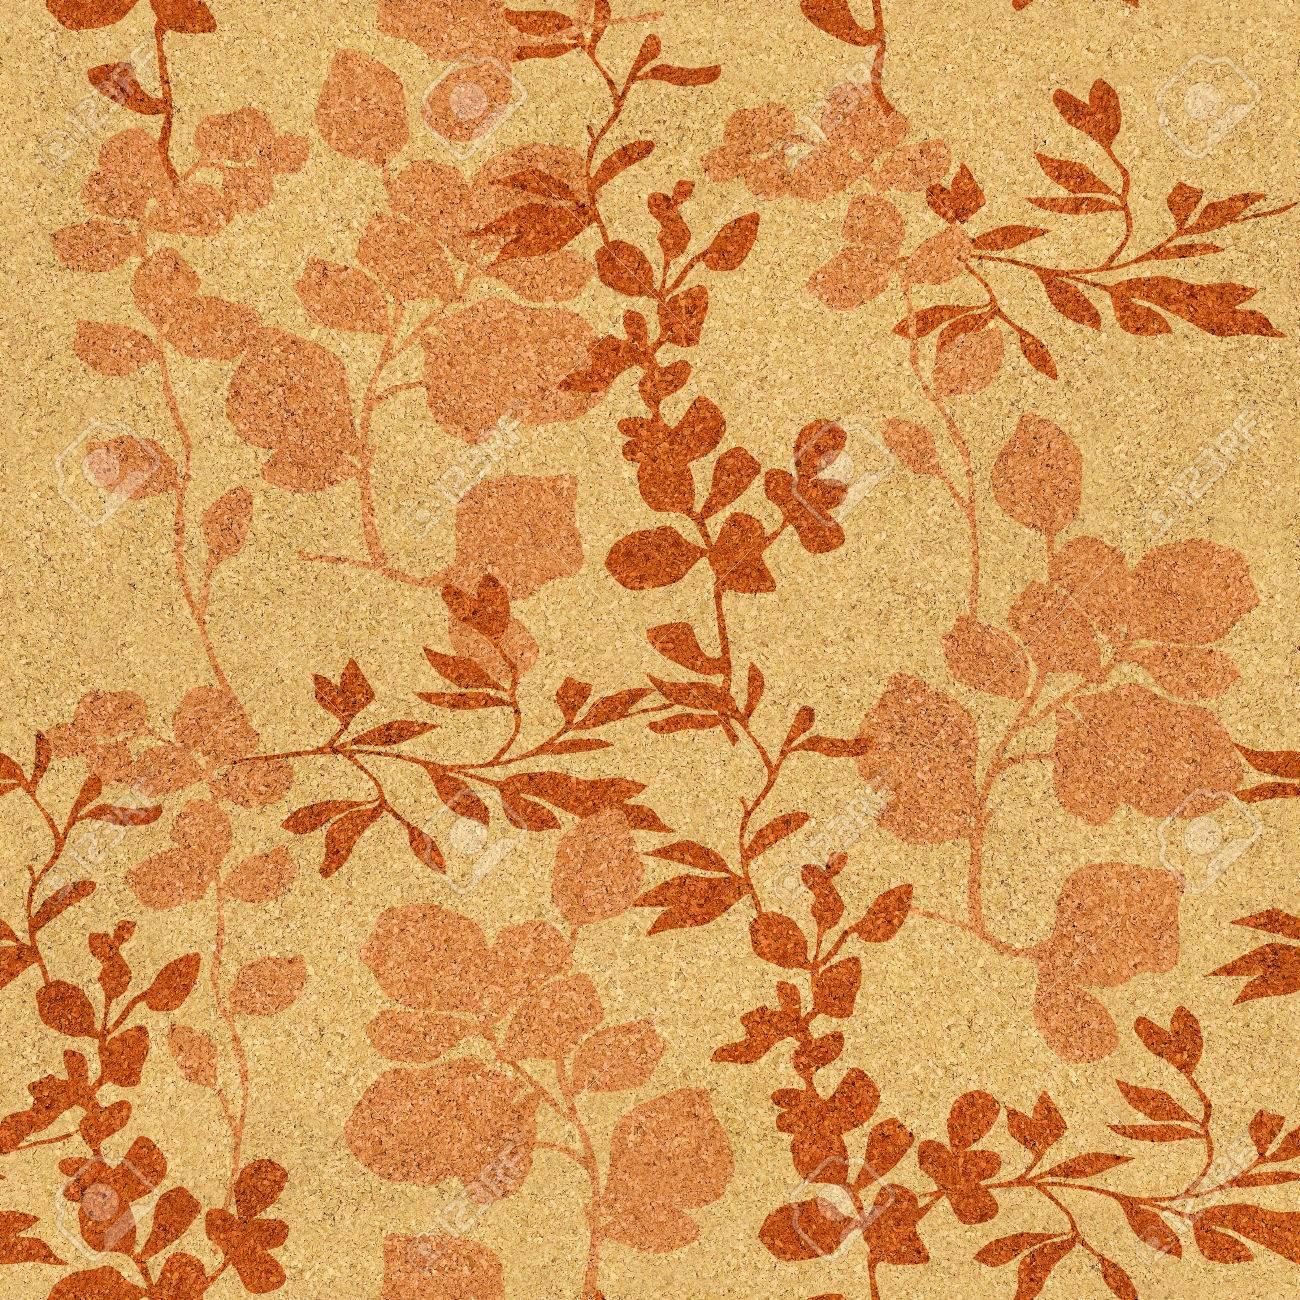 Floral Decorative Pattern - Interior Wall Decoration - Texture ...